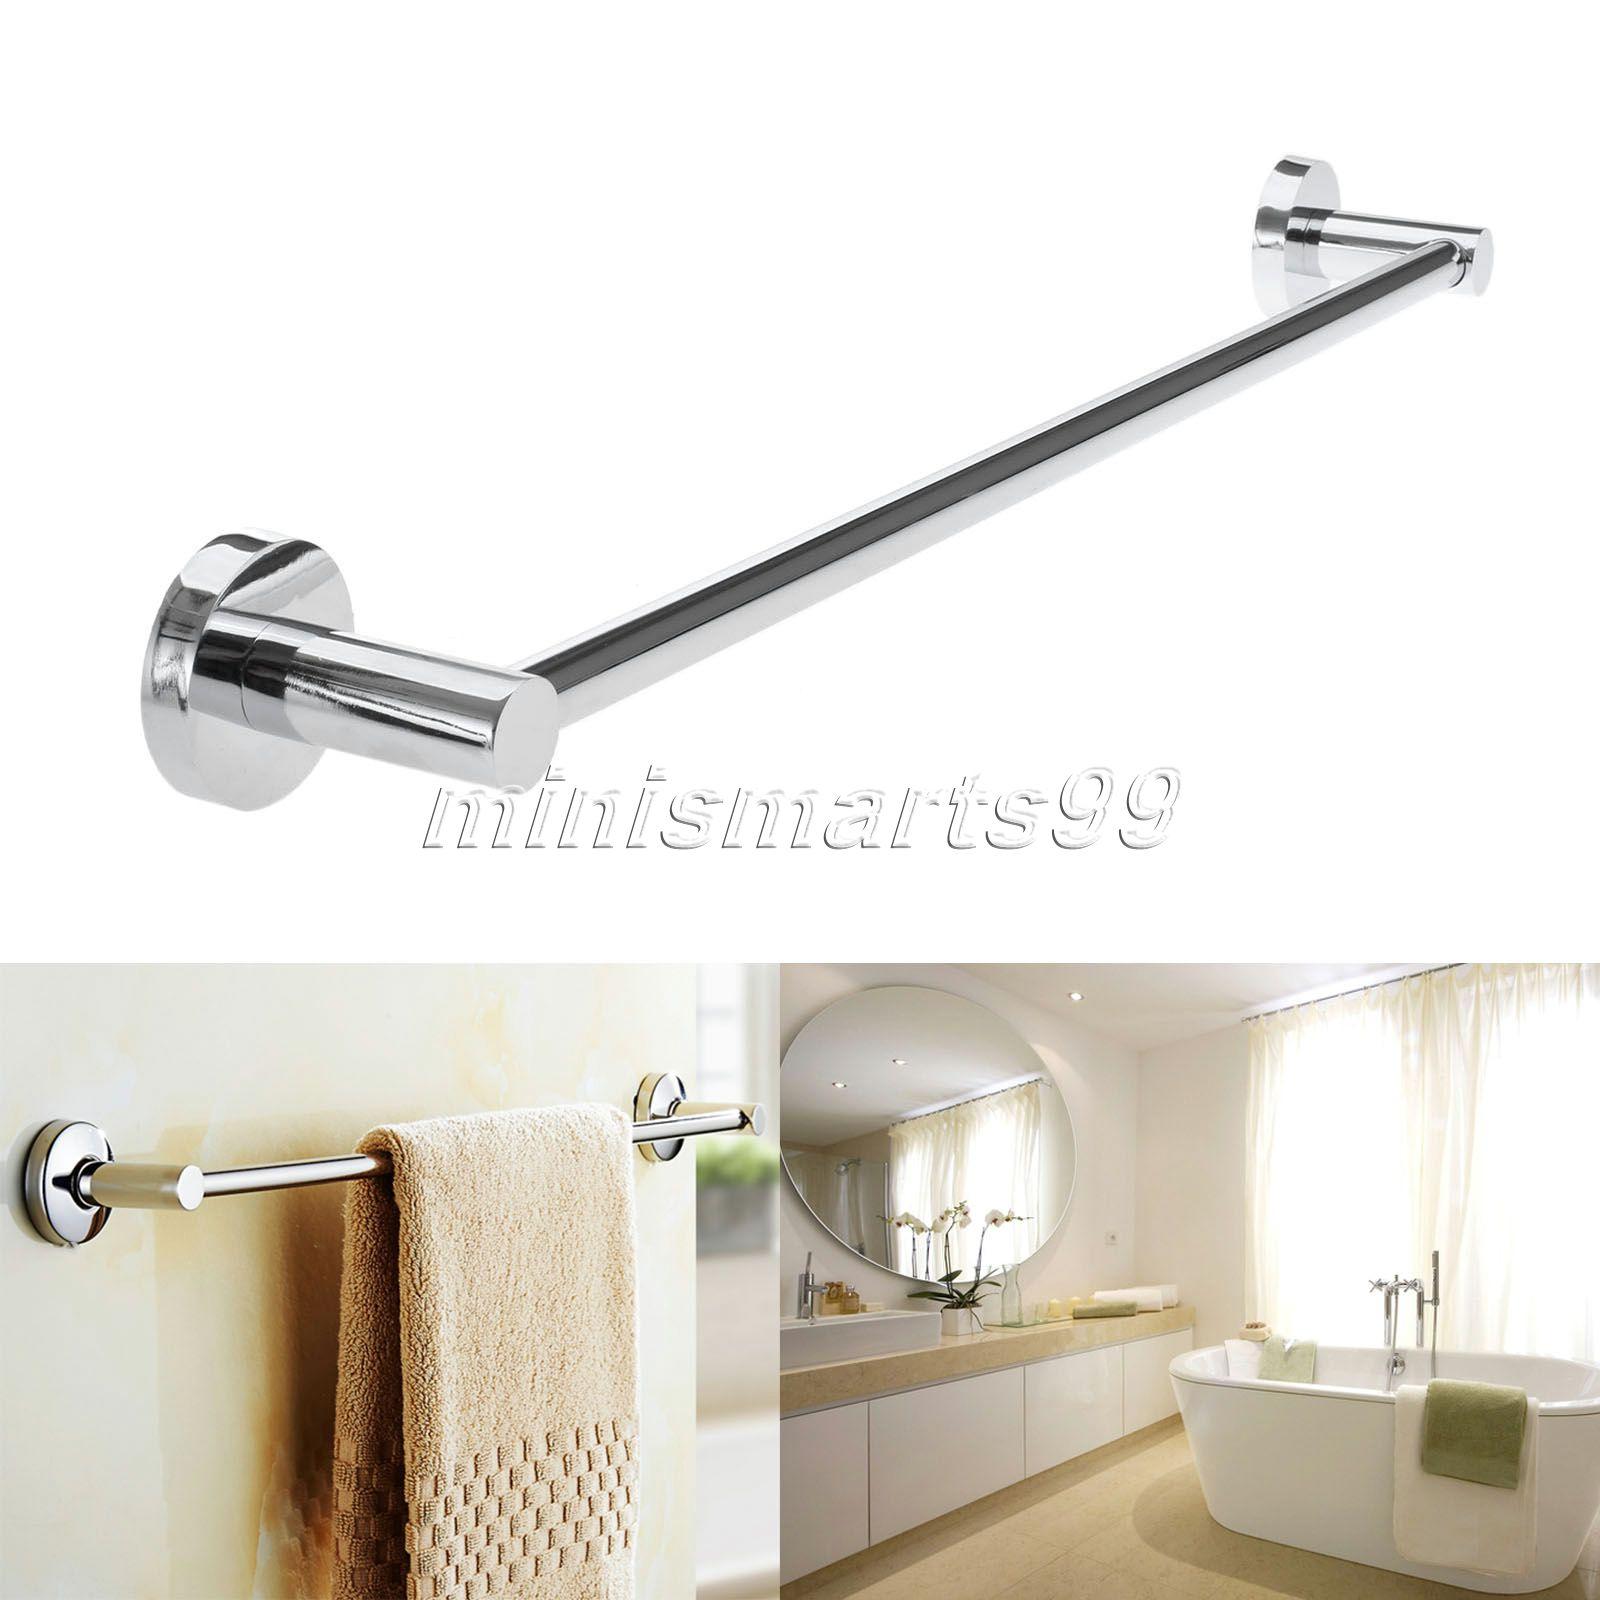 Wall Rack For Bathroom : 60cm Steel Towel Rack Holder Wall Mounted Bathroom Towel Holders ...